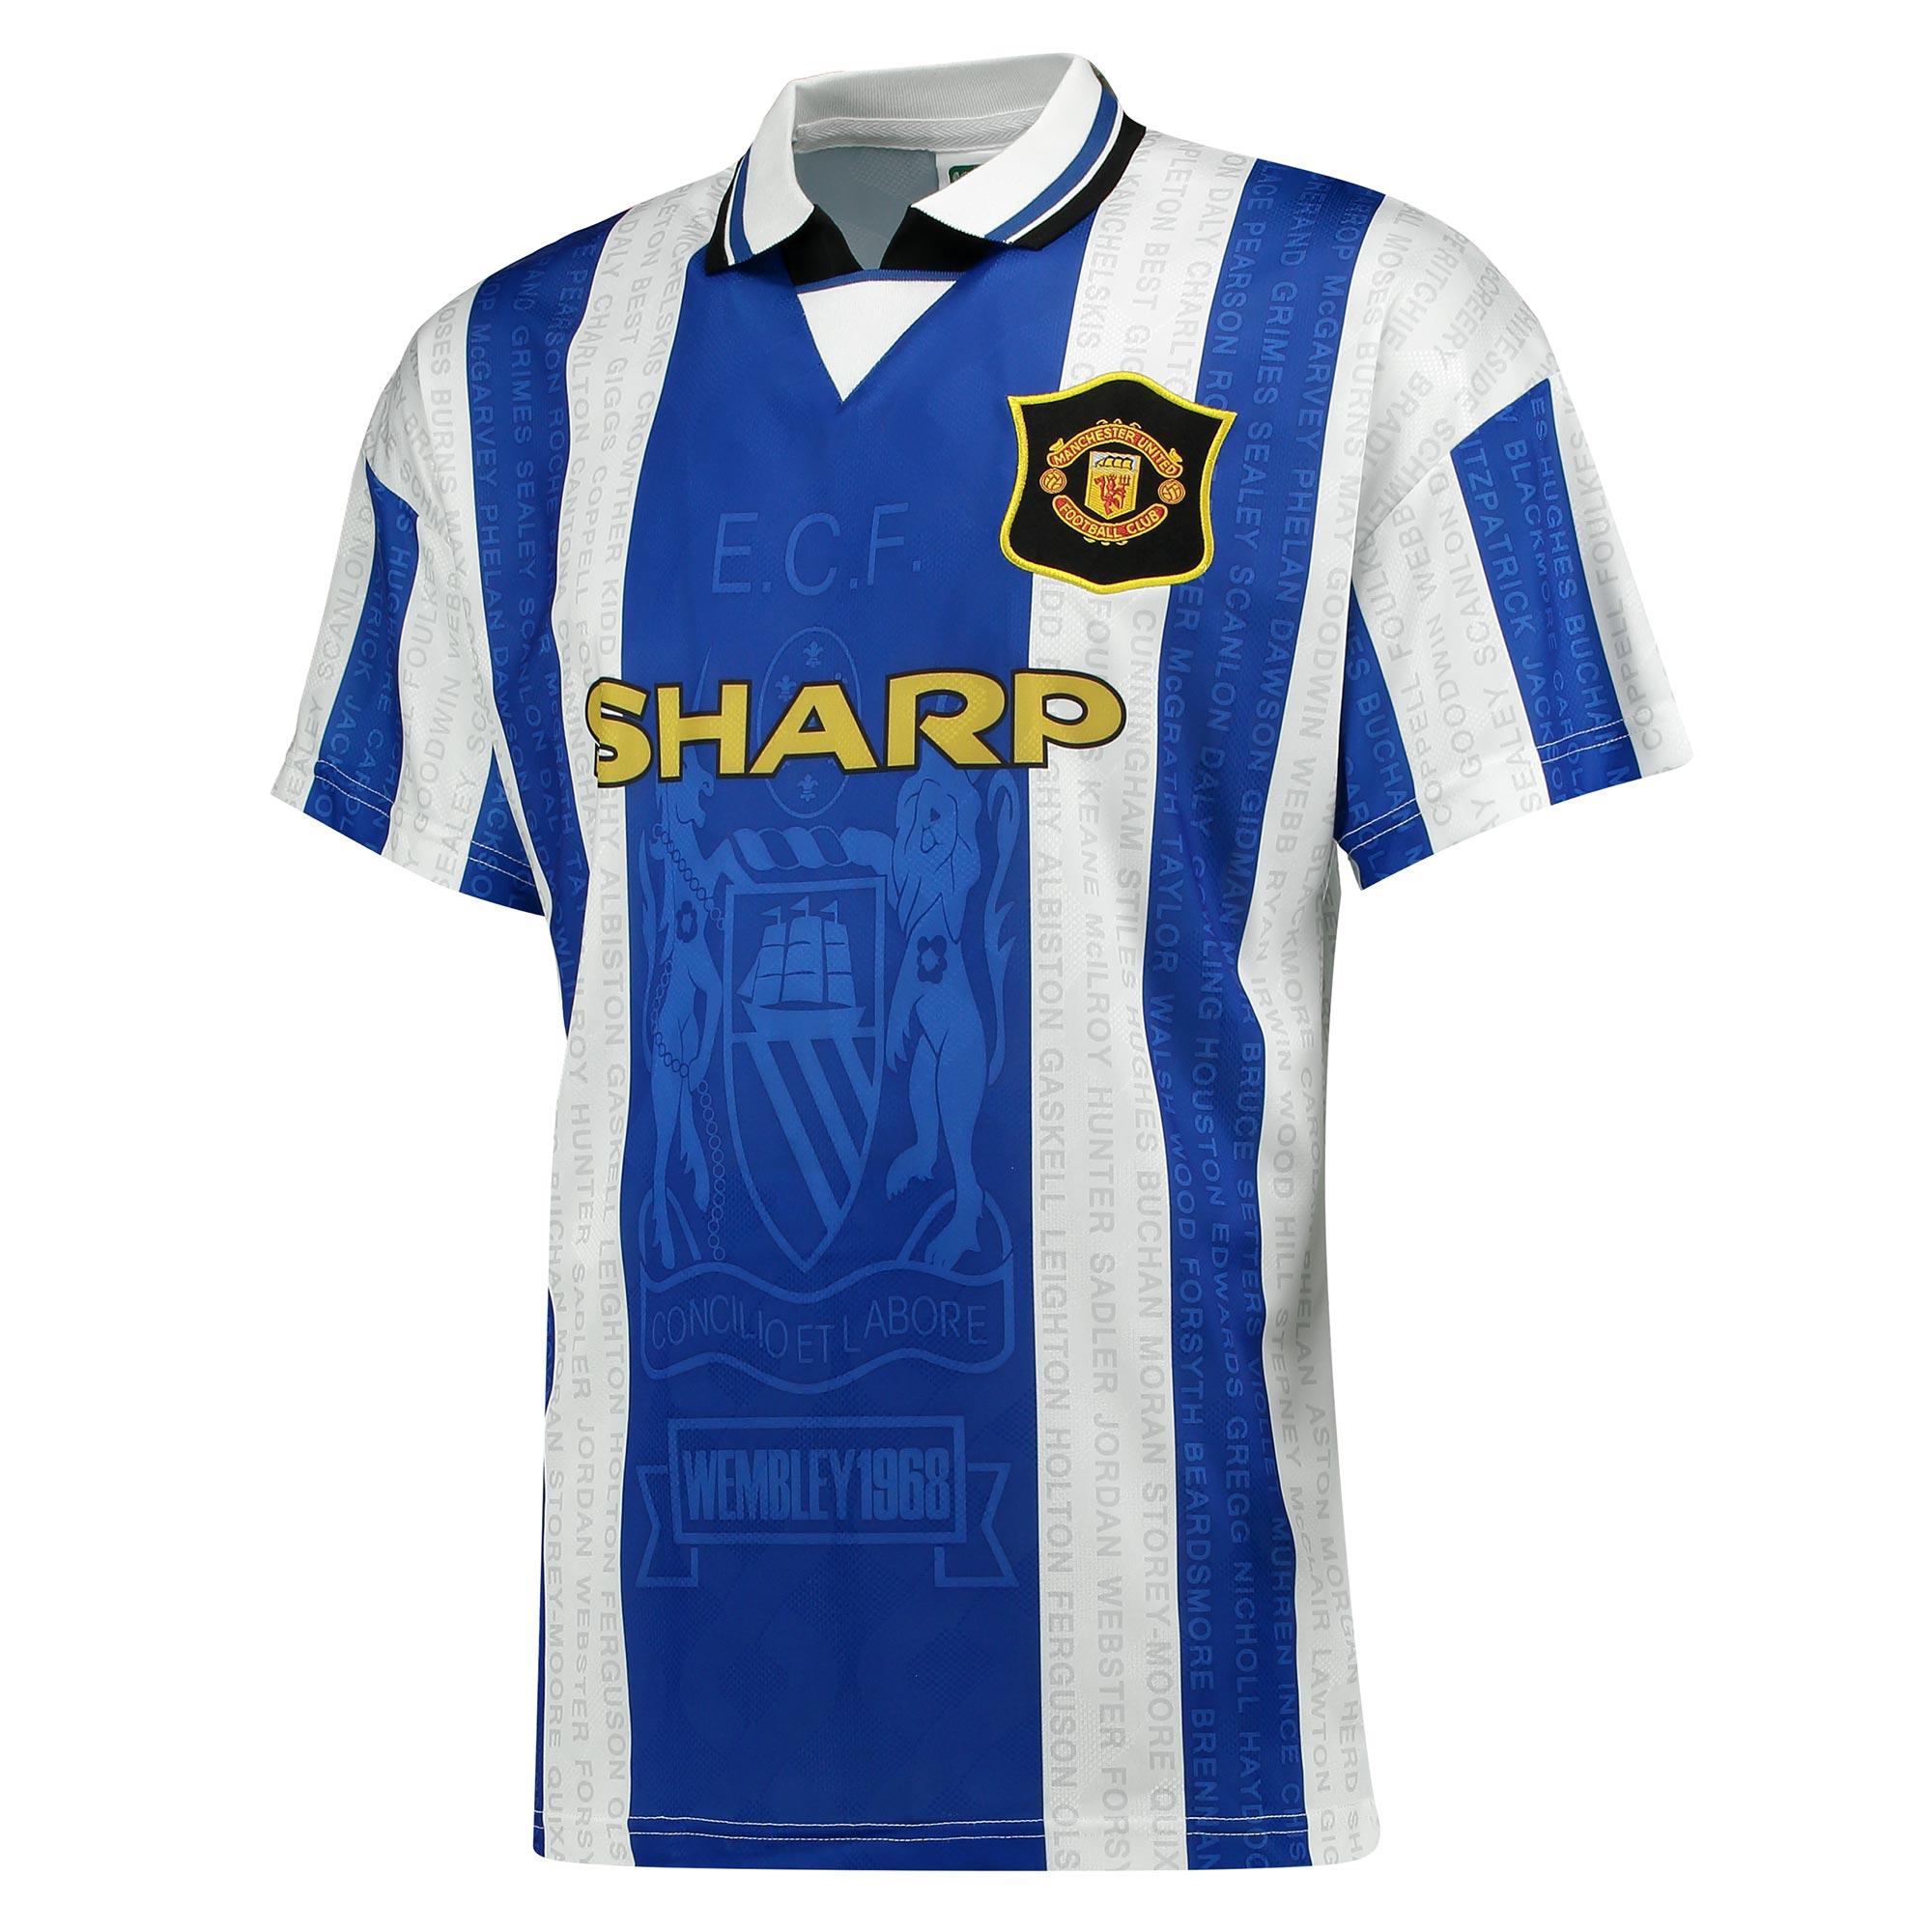 Manchester United 1996 Third shirt